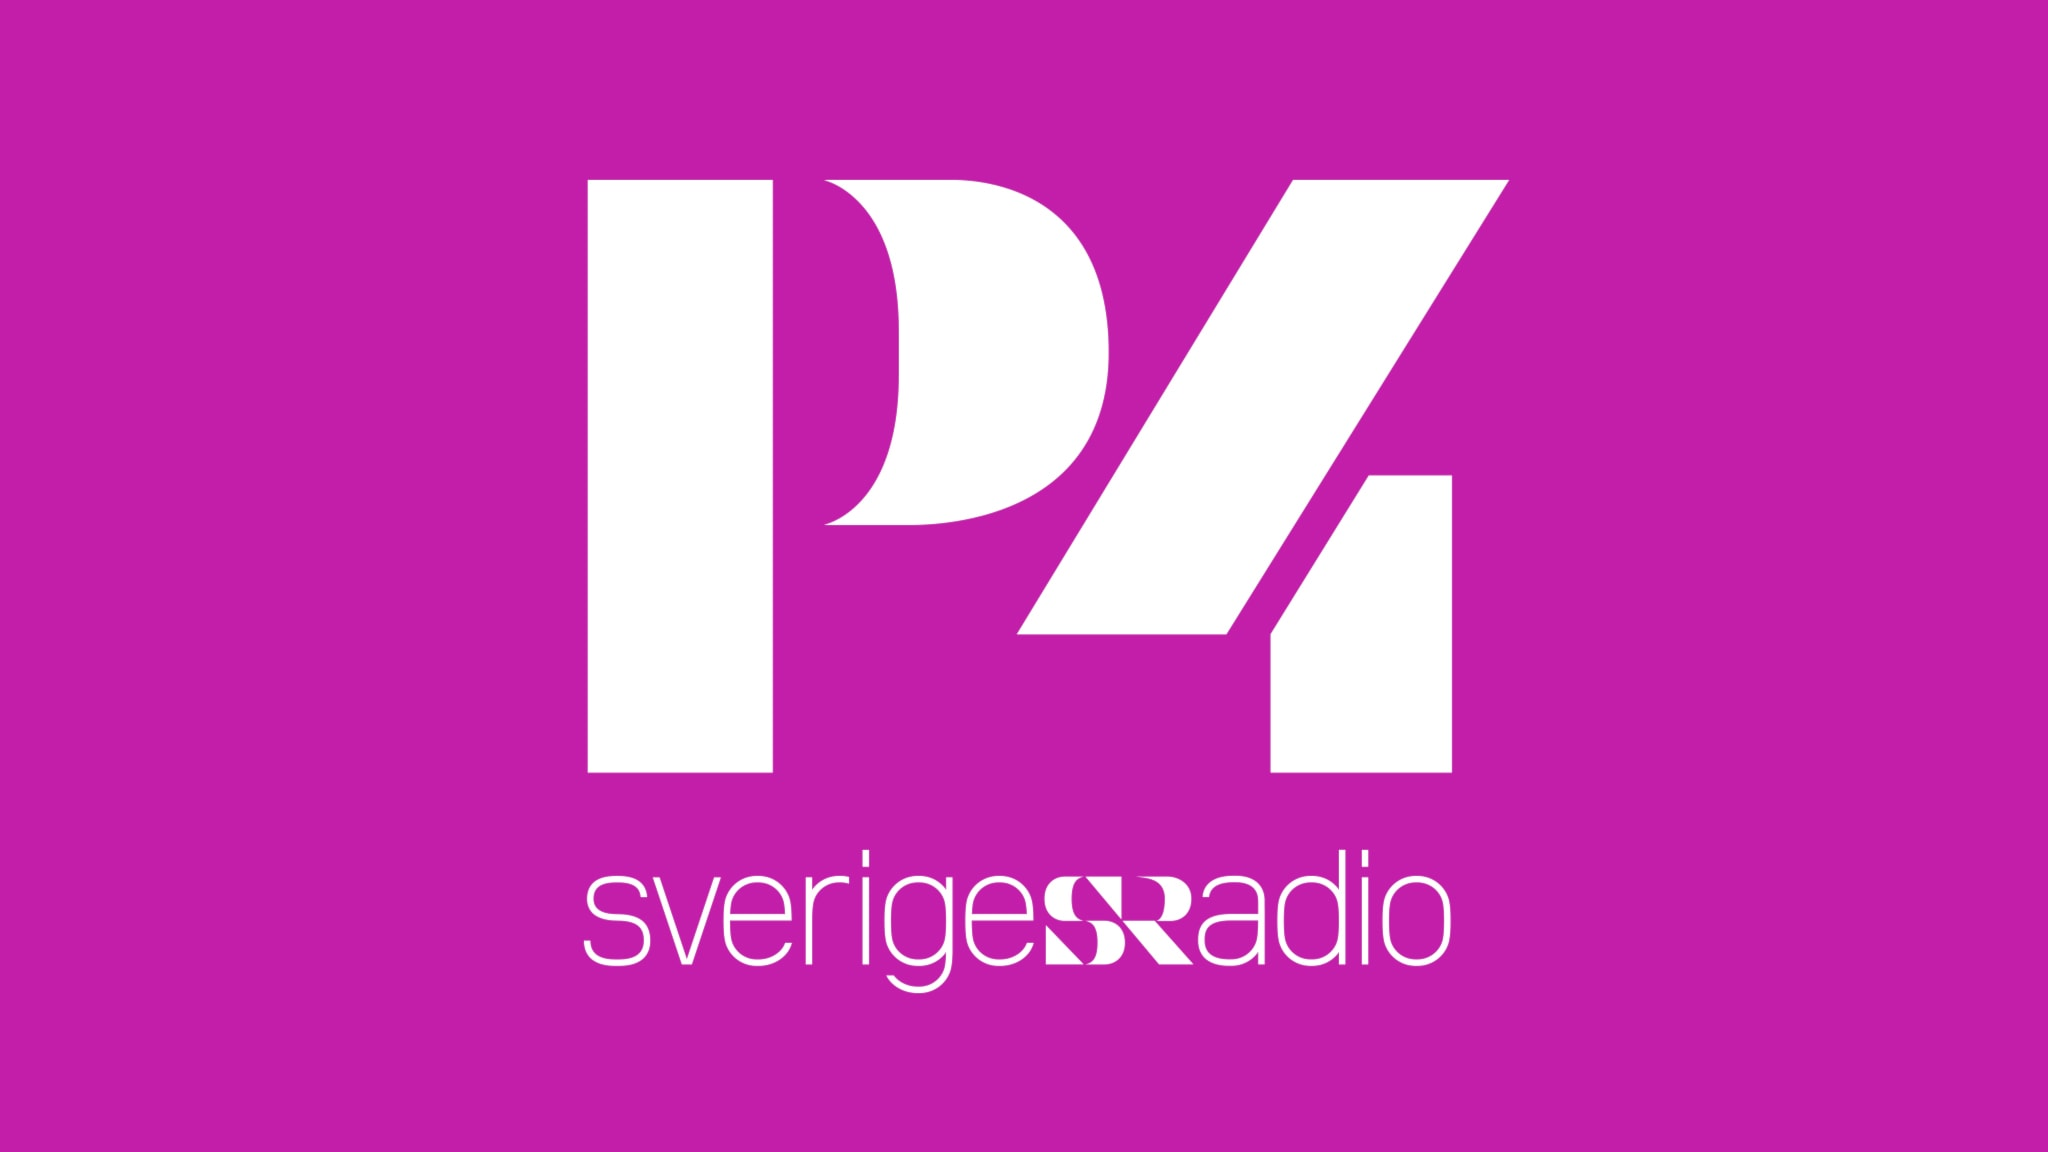 Trafik P4 Stockholm 20190625 09.26 (00.44)